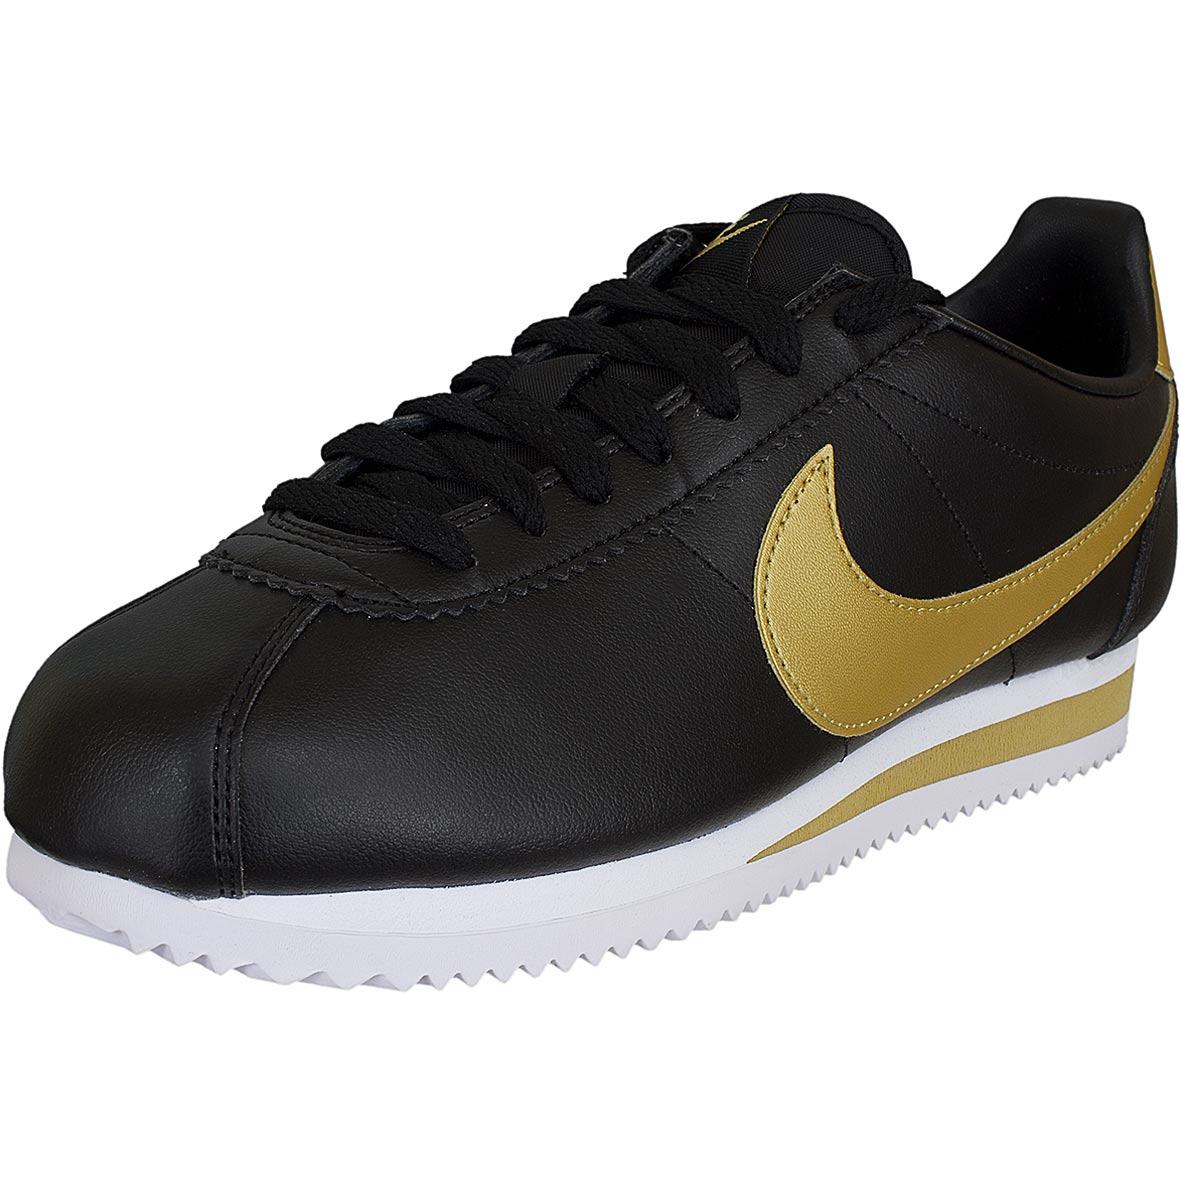 4c03c2a37d58 ☆ Nike Damen Sneaker Classic Cortez Leather schwarz gold - hier ...